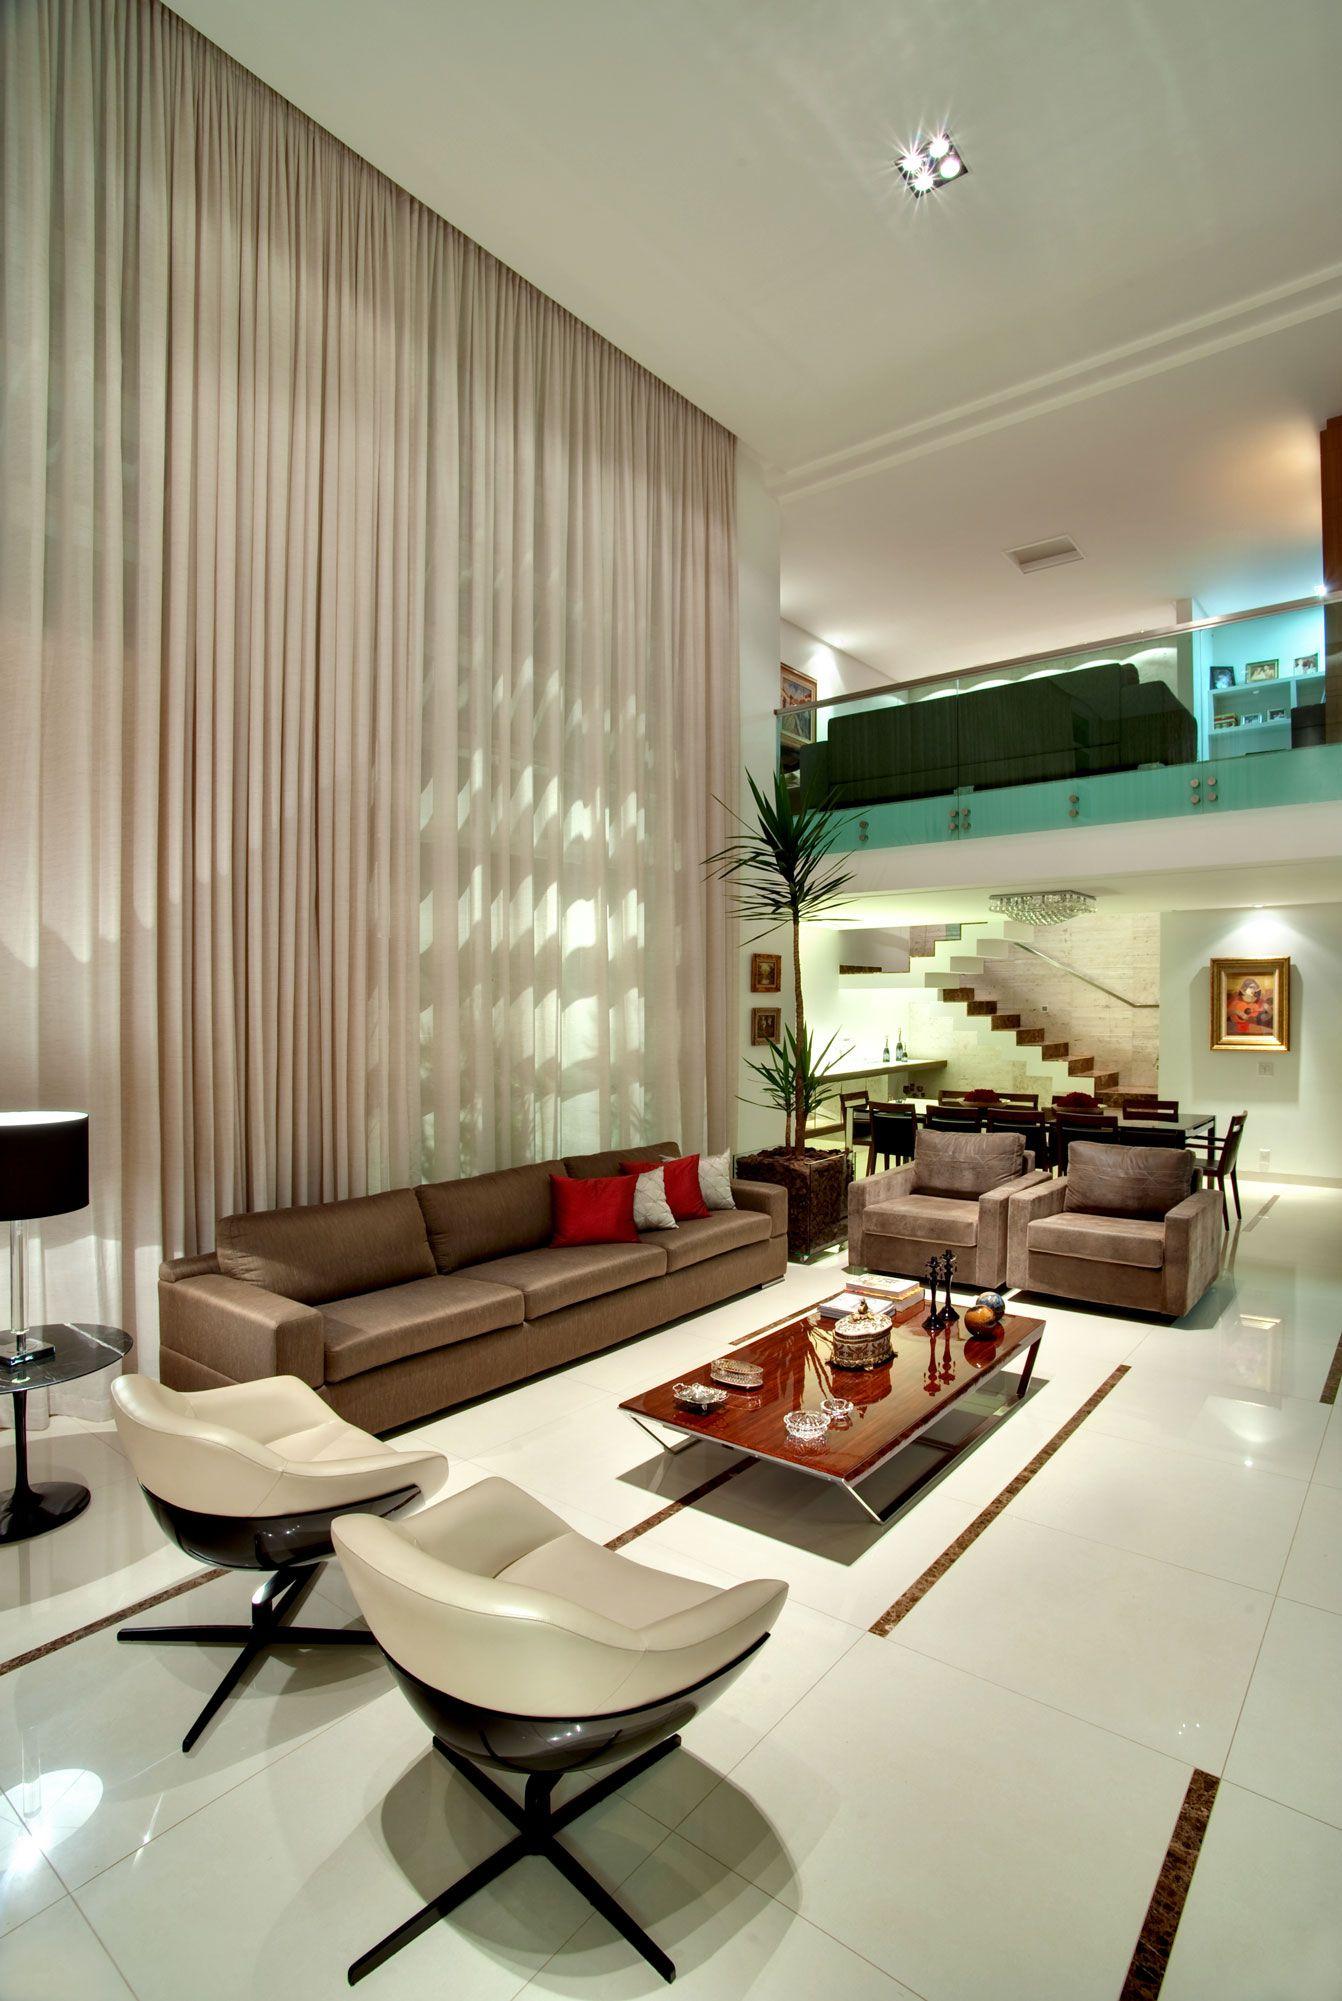 Modern Luxury Home Interior Living Room Atenas 038 House 05 Imposing In Brazil By Dayala Rafael Arquitetura